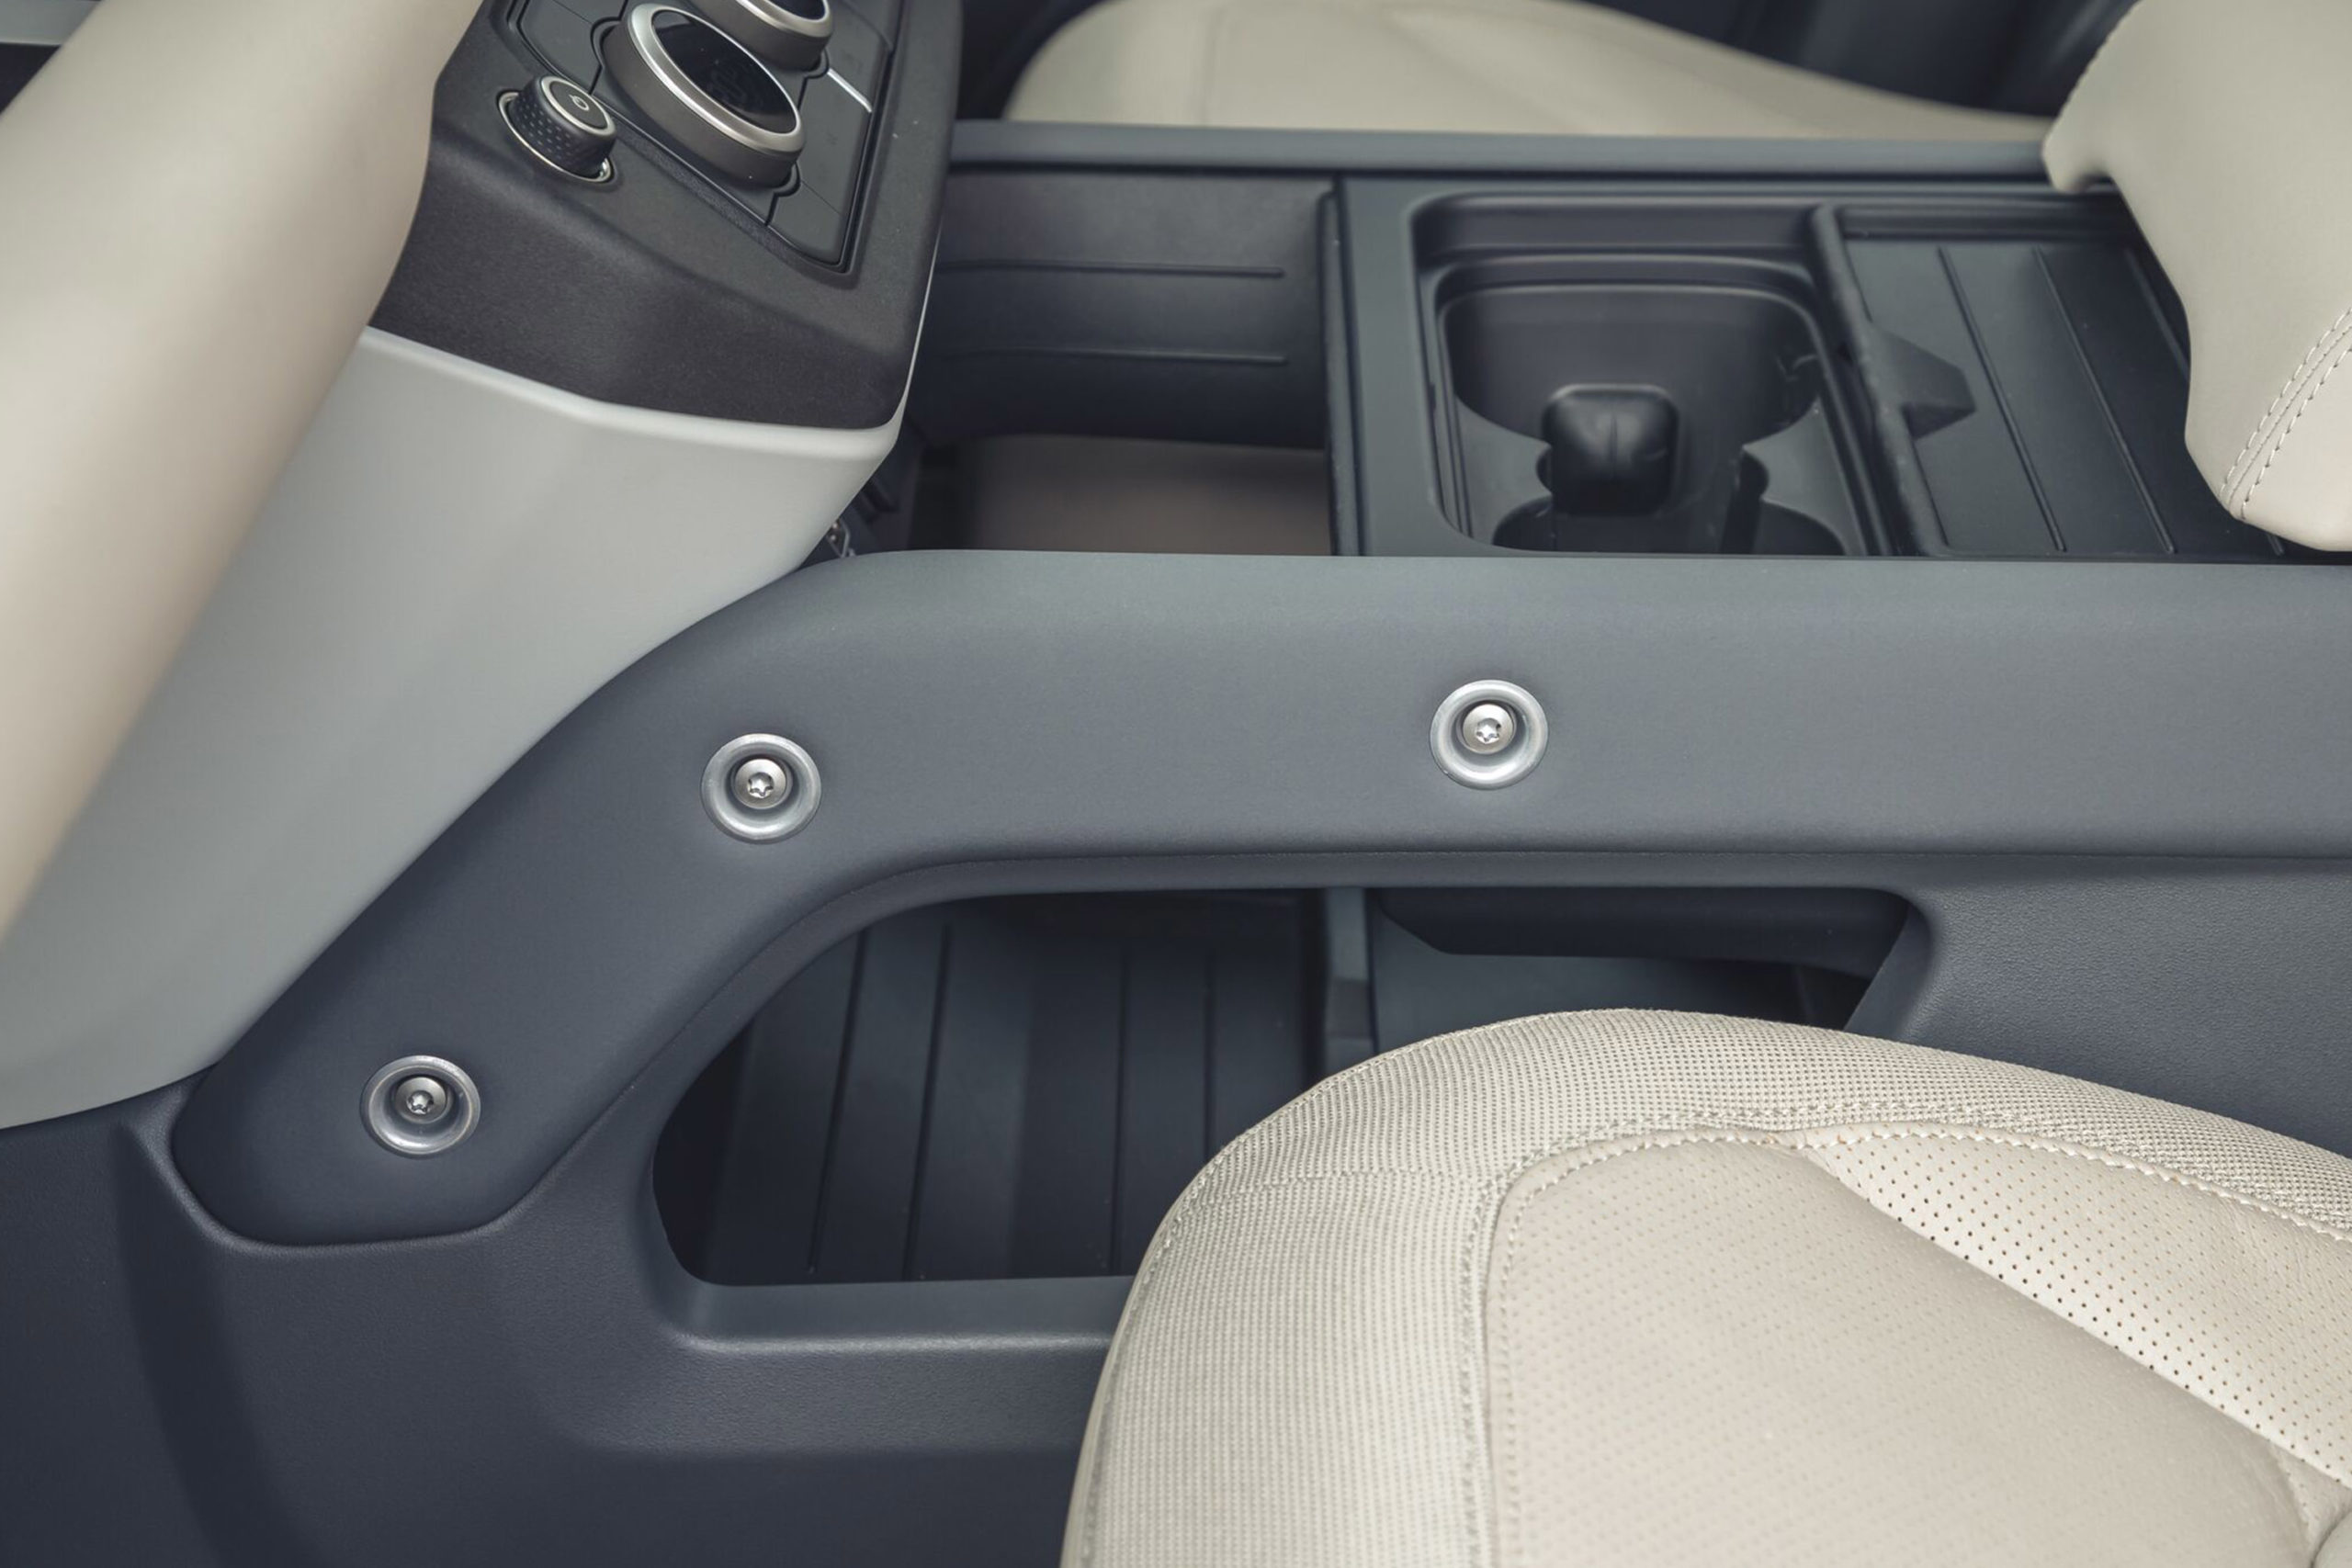 2020-Land-Rover-Defender-exposed-screws